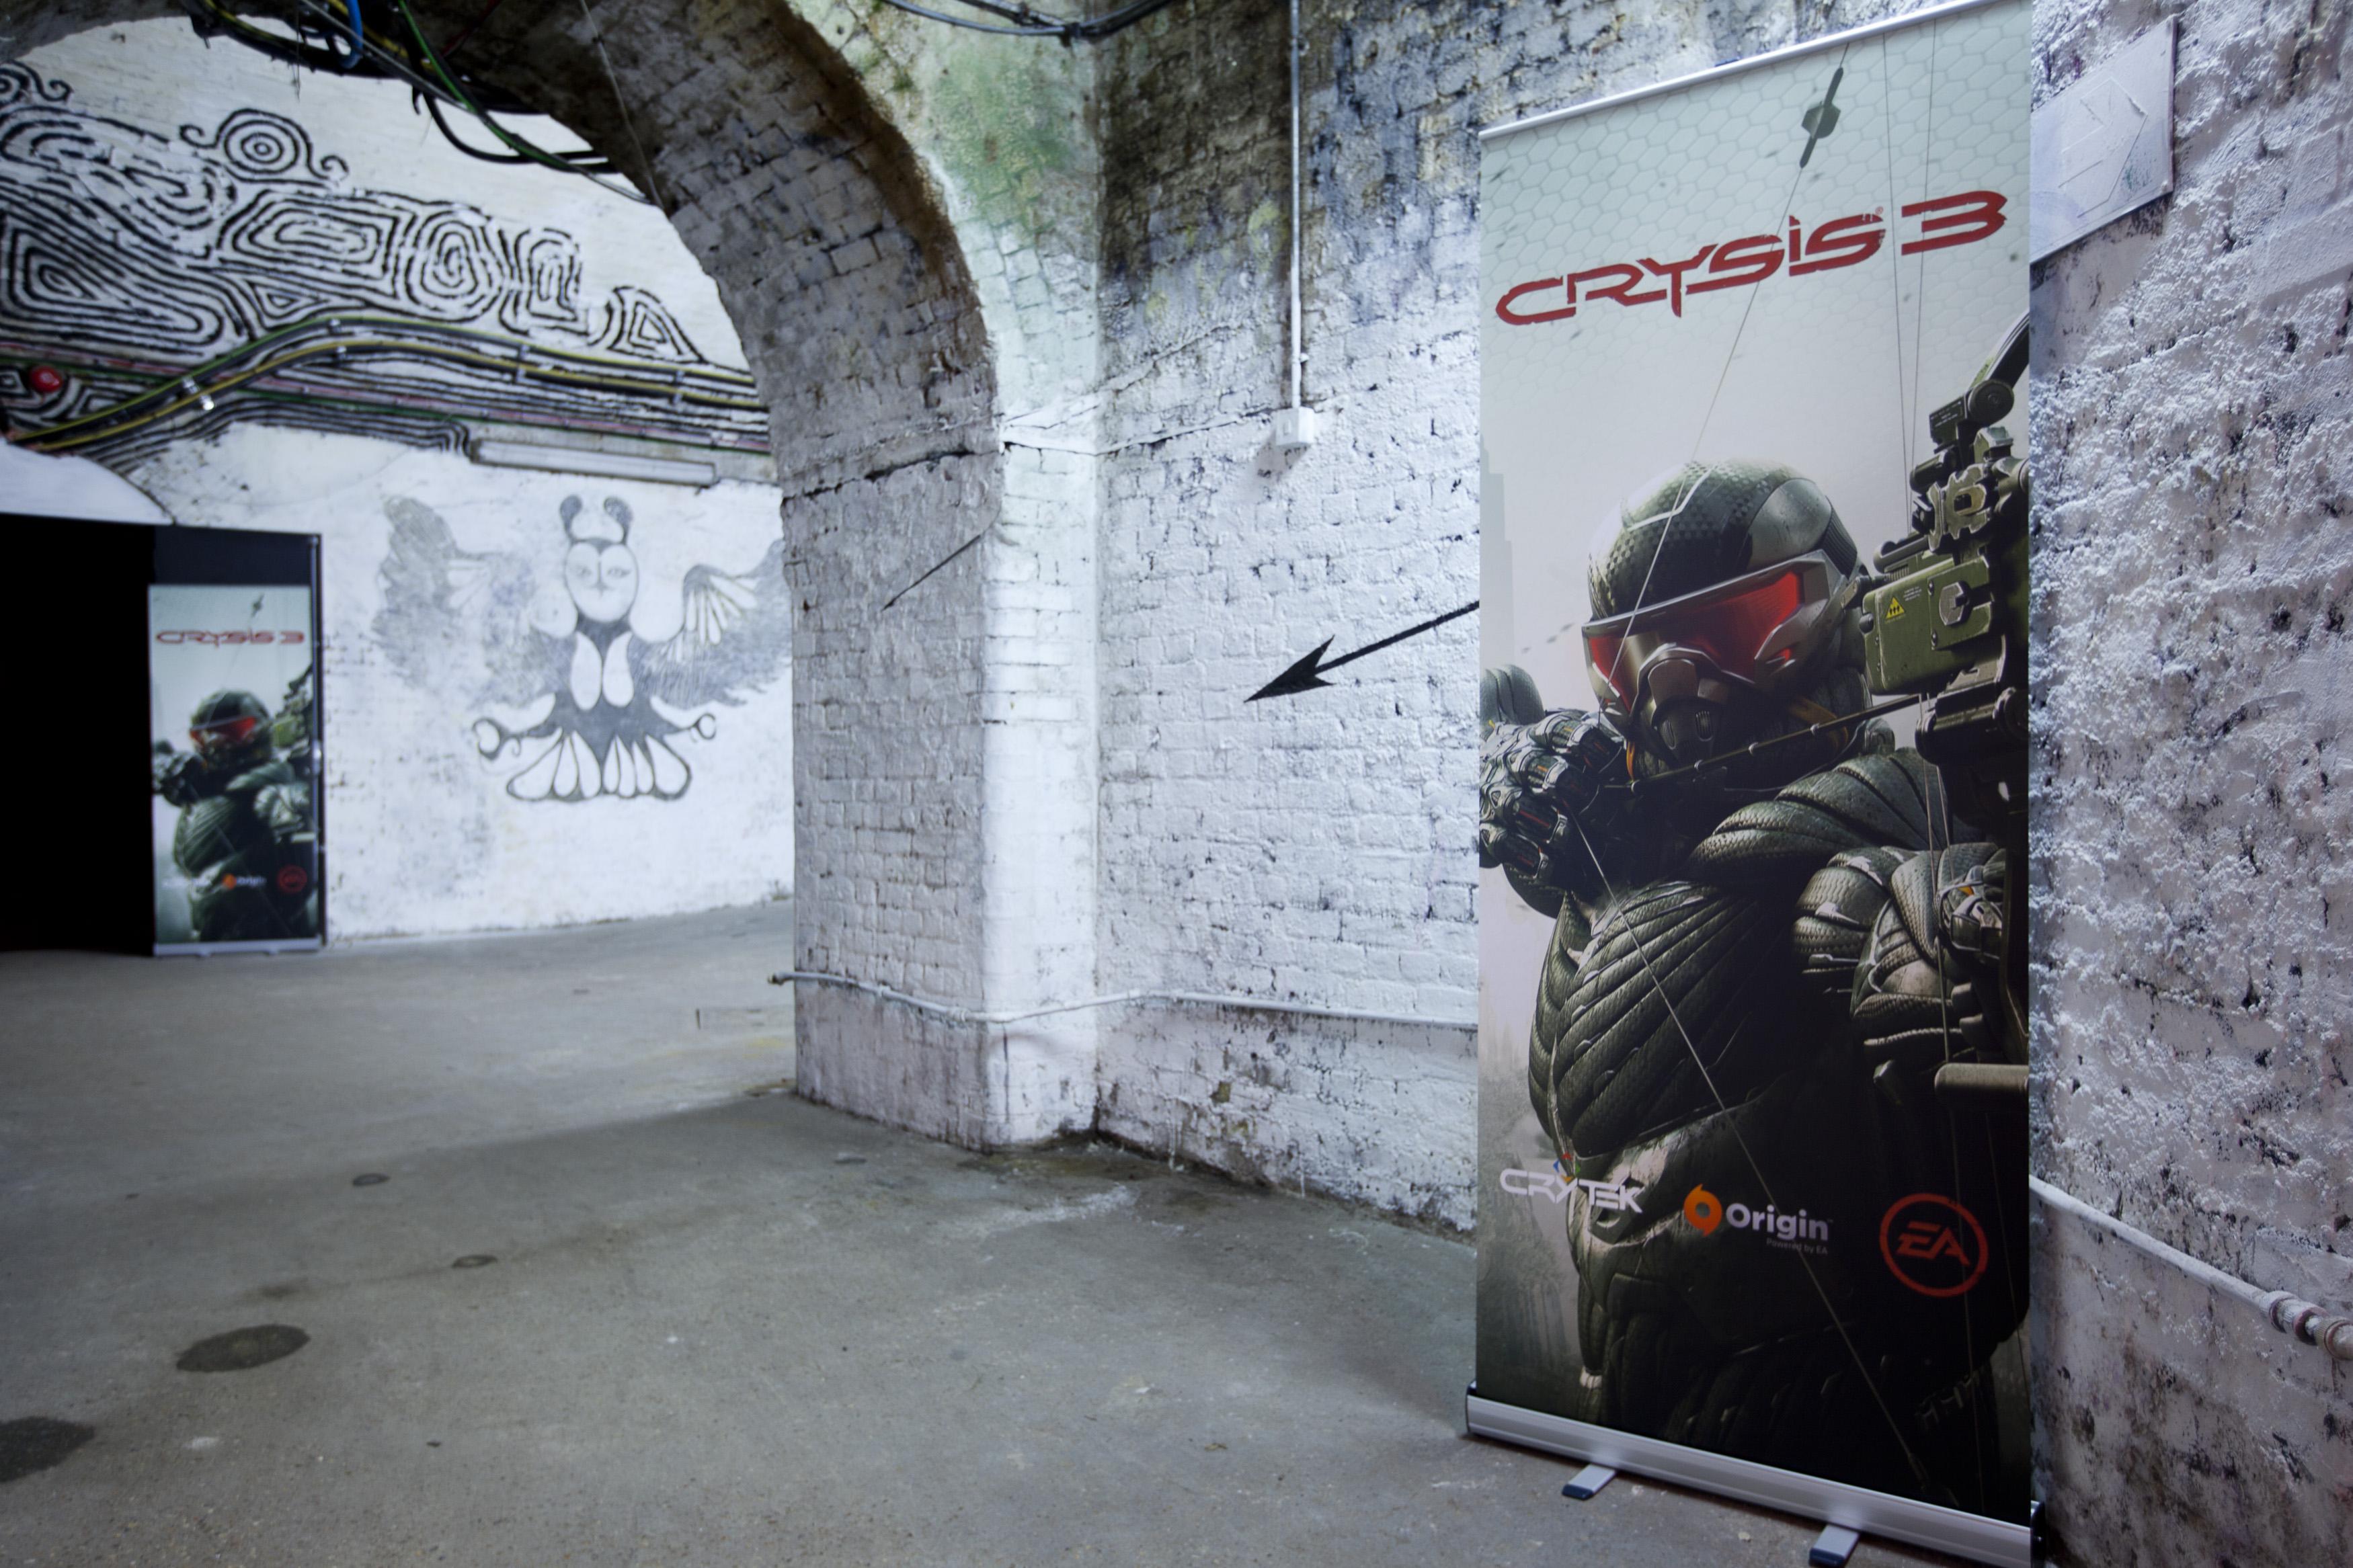 2013-02-17-Crysis3UrbanArchery0055DS.jpg